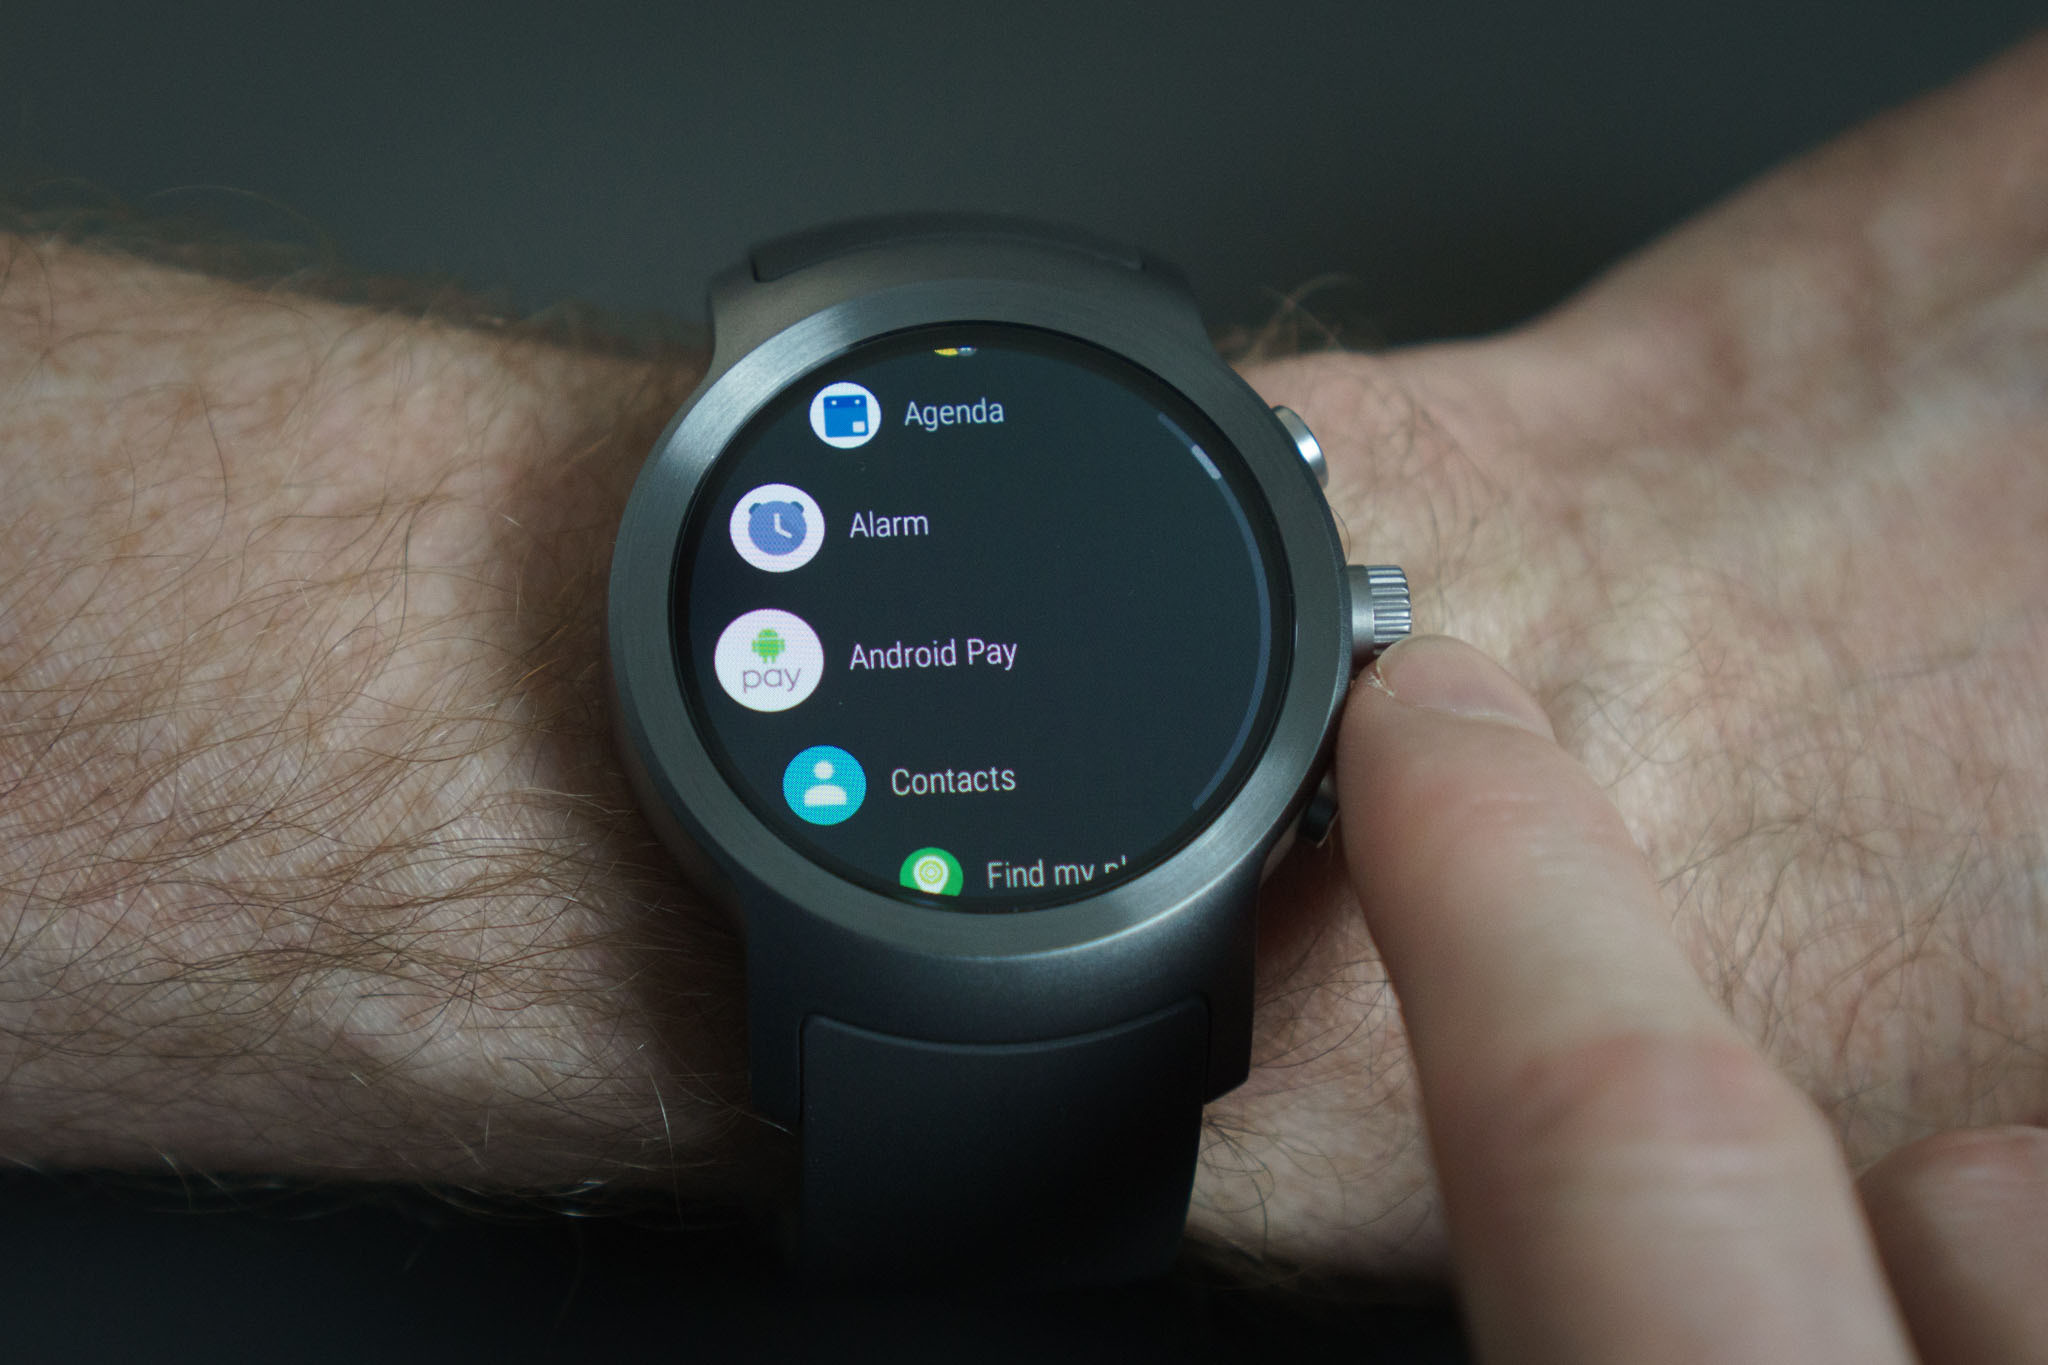 Топ-5 устройств на системе Android - смарт-часы на Android